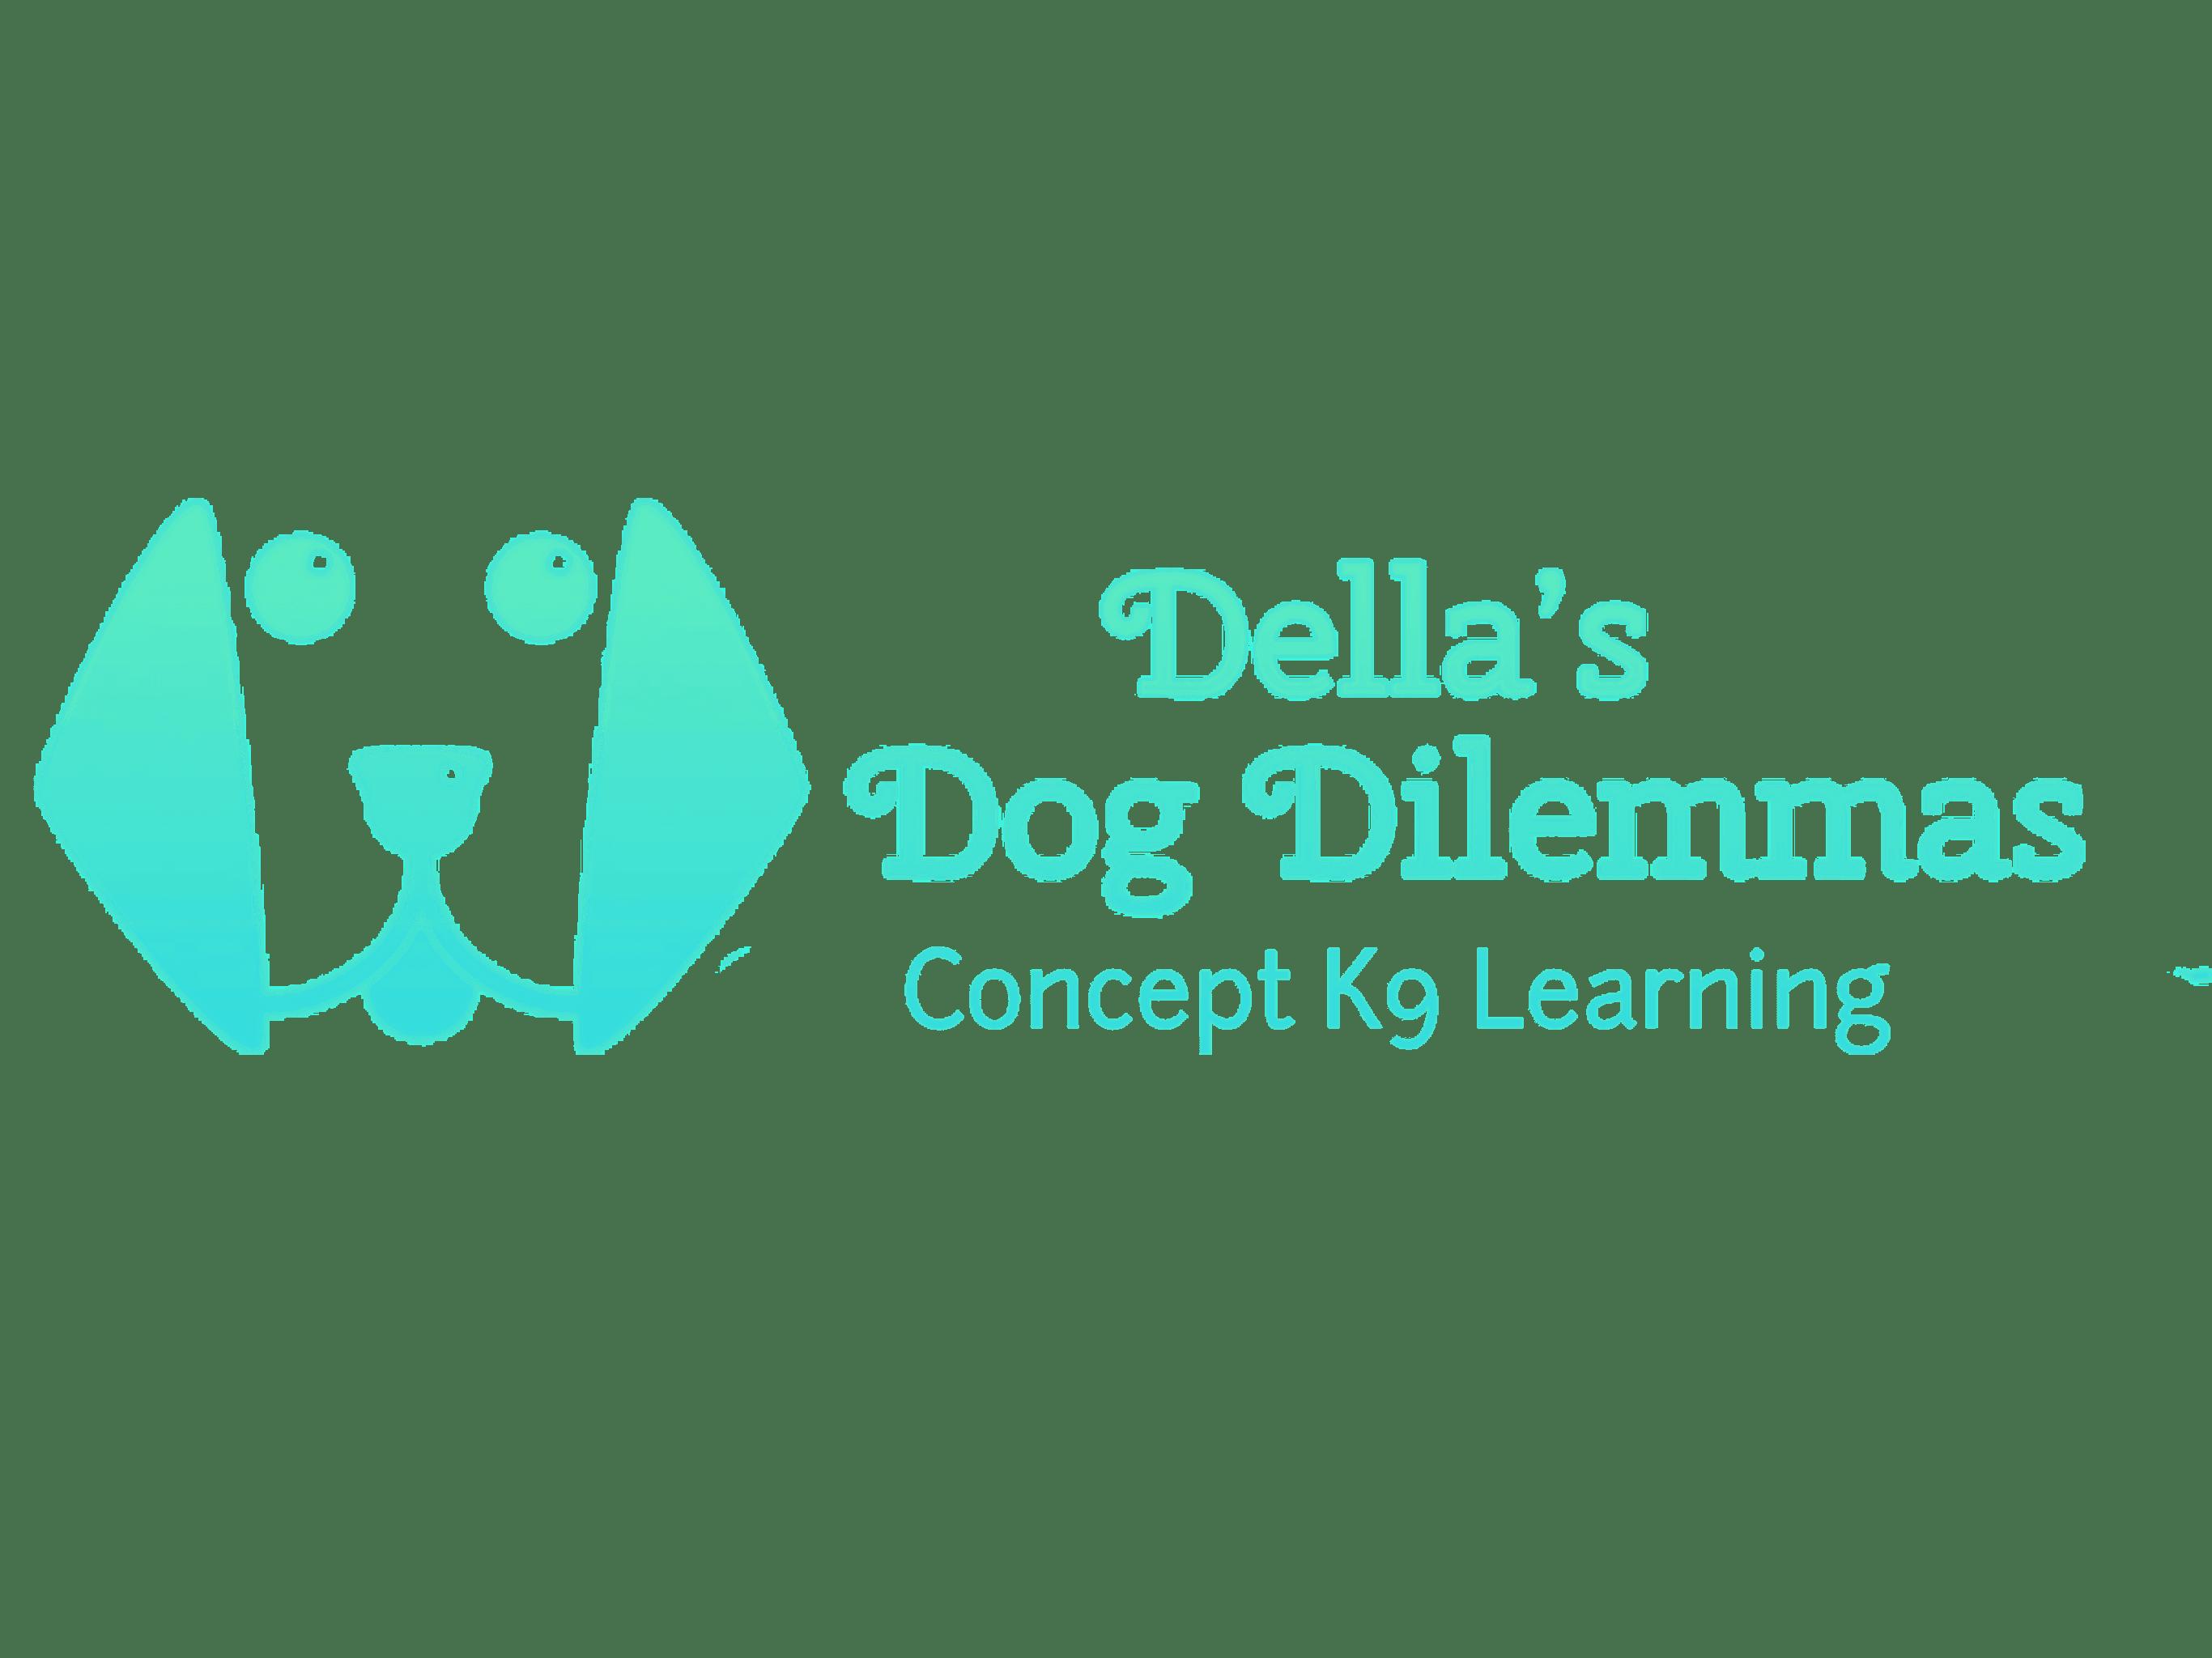 Della's Dog Dilemmas